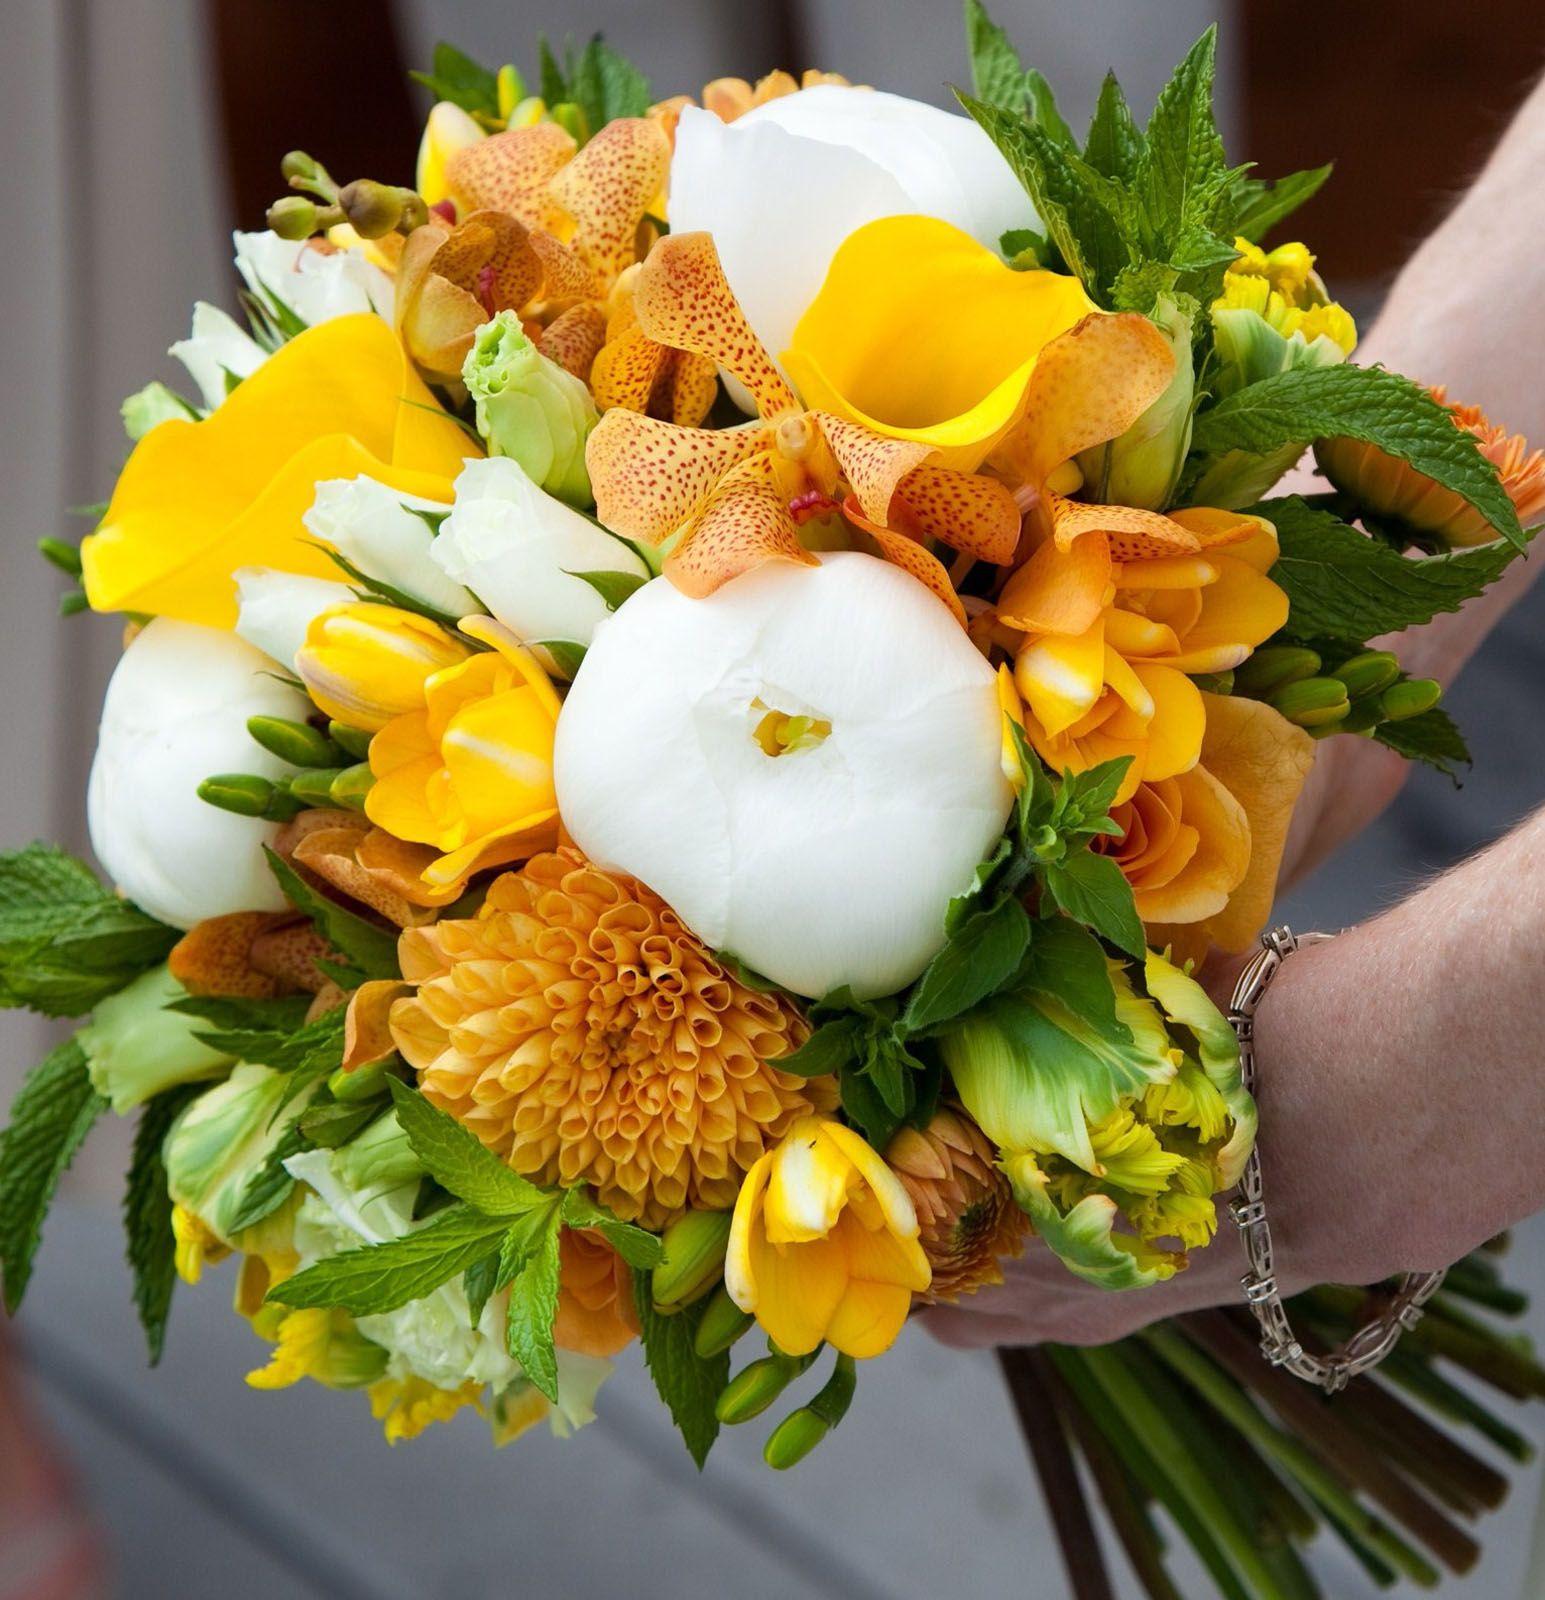 Vermont Wedding Flowers: White Peonies, Orange Dahlias, Yellow Callas, Tulips